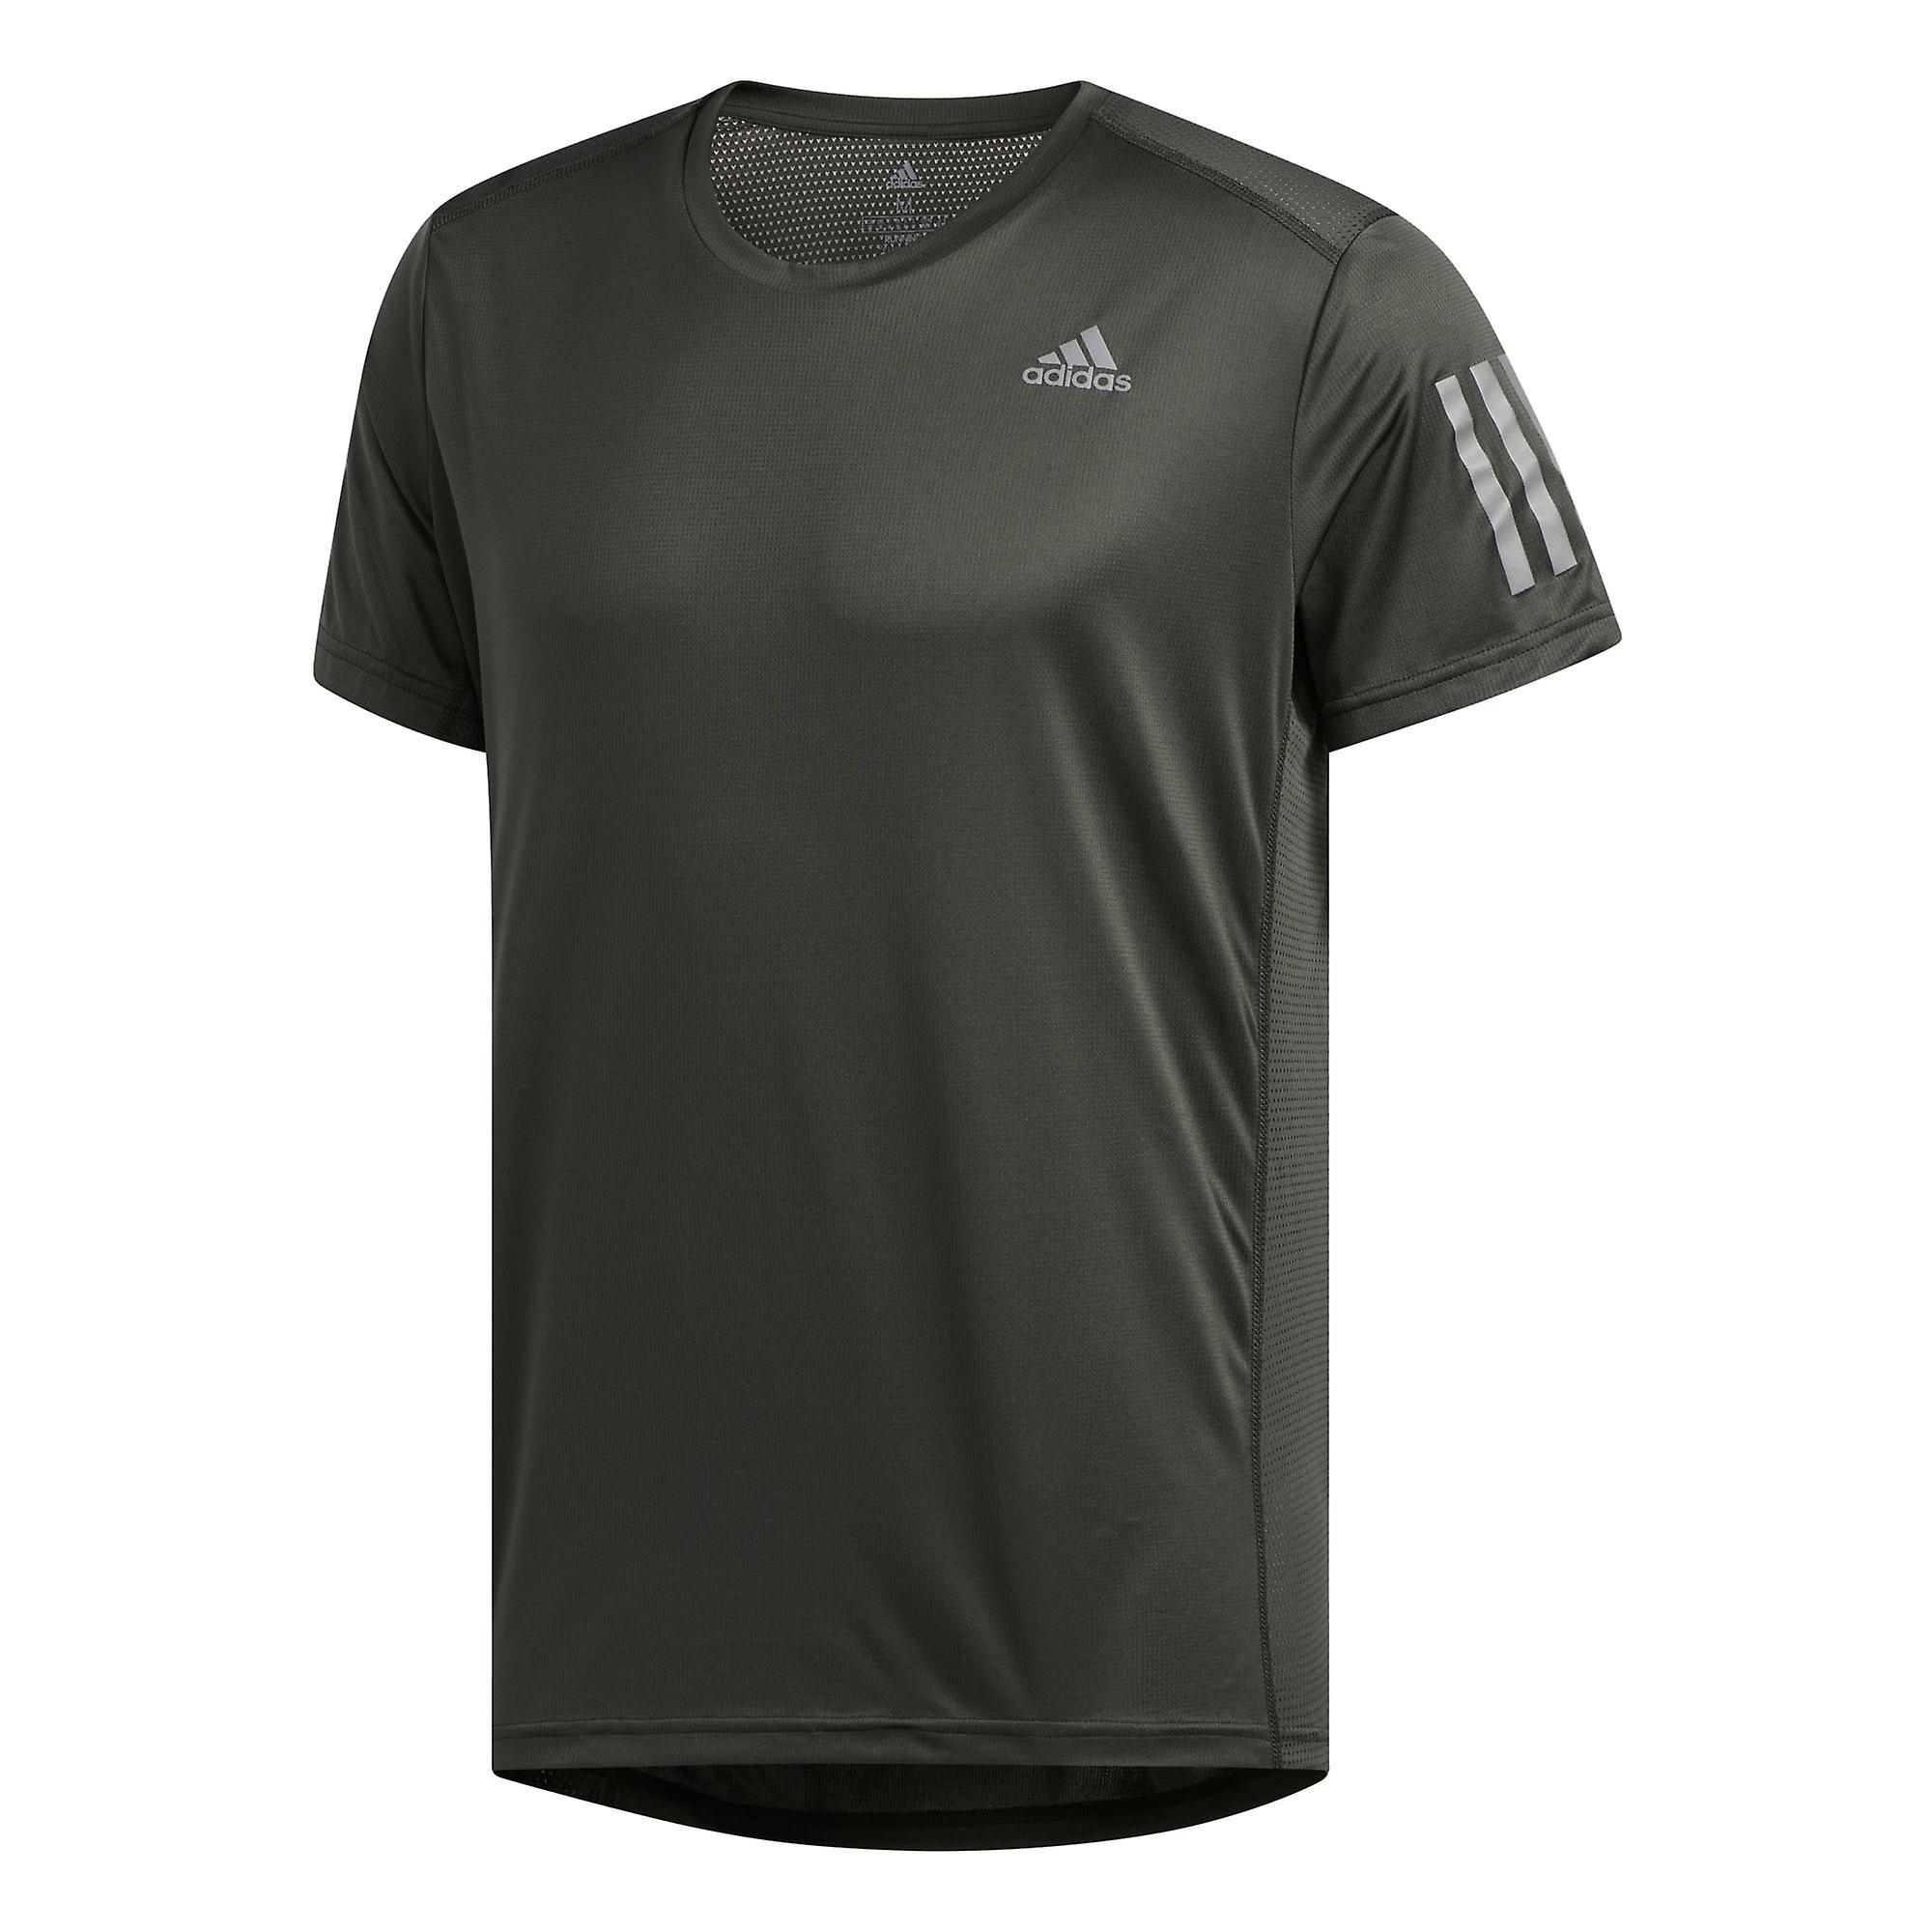 adidas Own The Run Mens Running Fitness Training T-Shirt Tee Grey